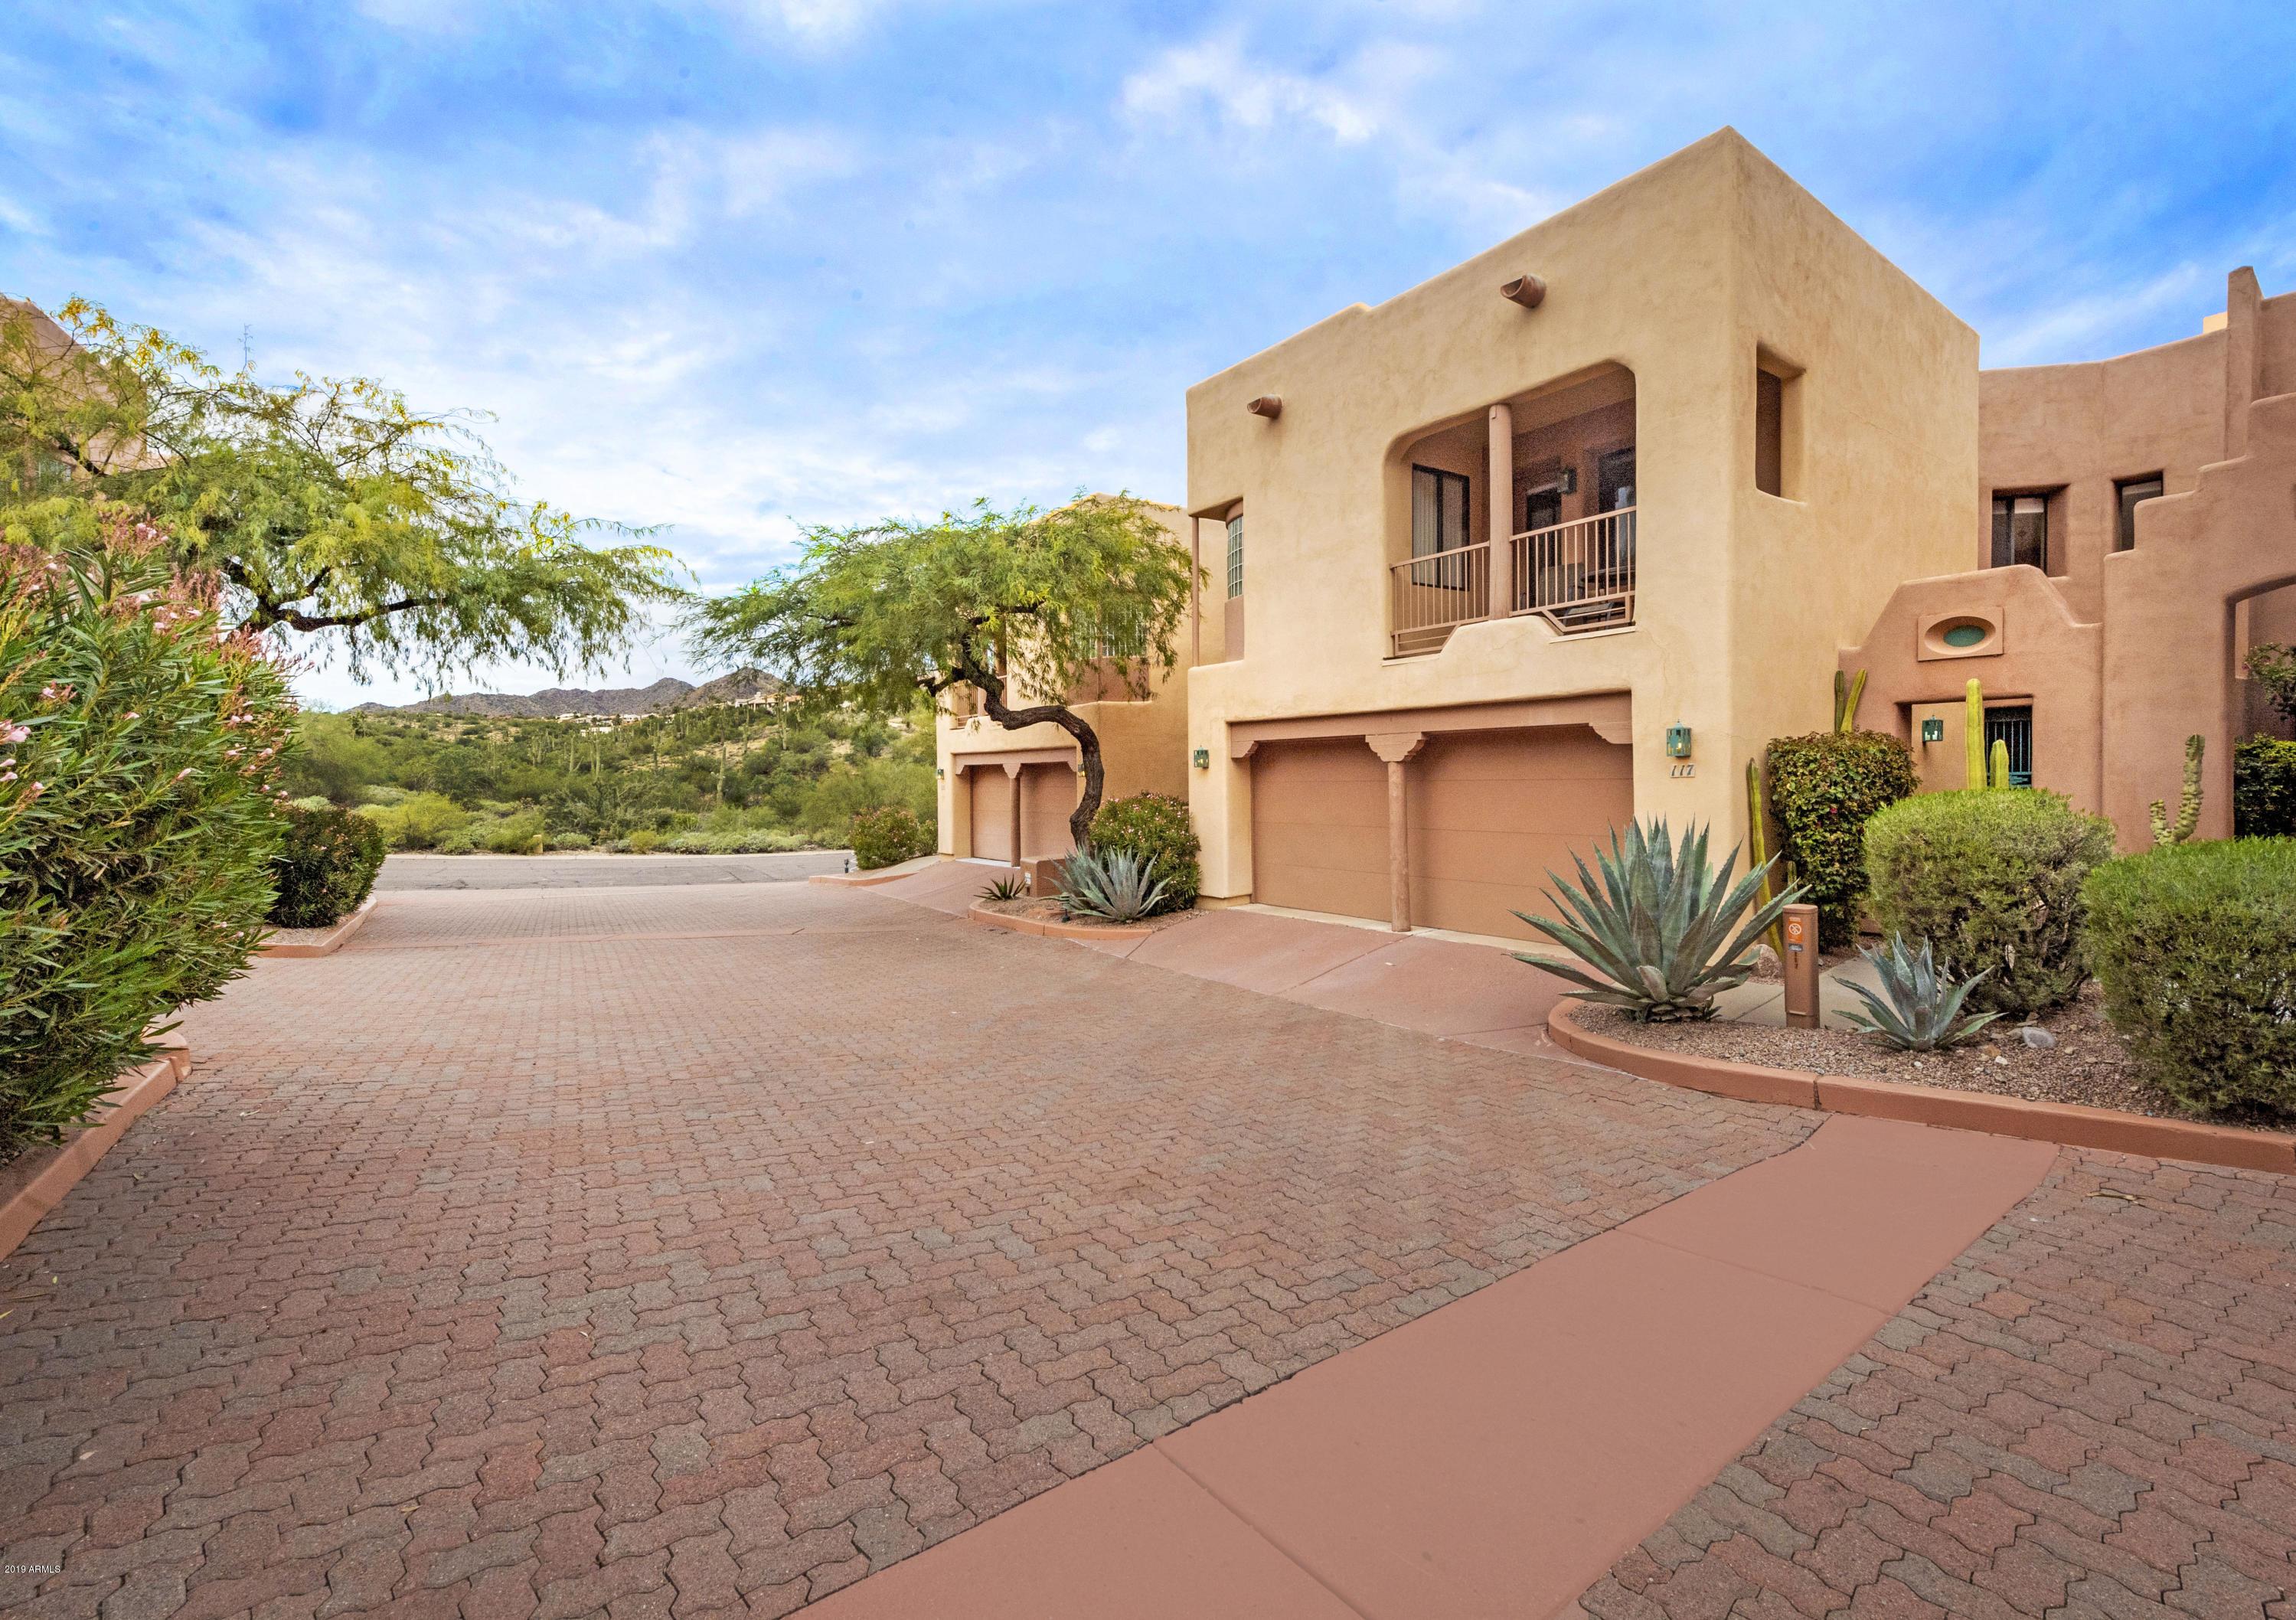 Photo of 13227 N MIMOSA Drive #117, Fountain Hills, AZ 85268